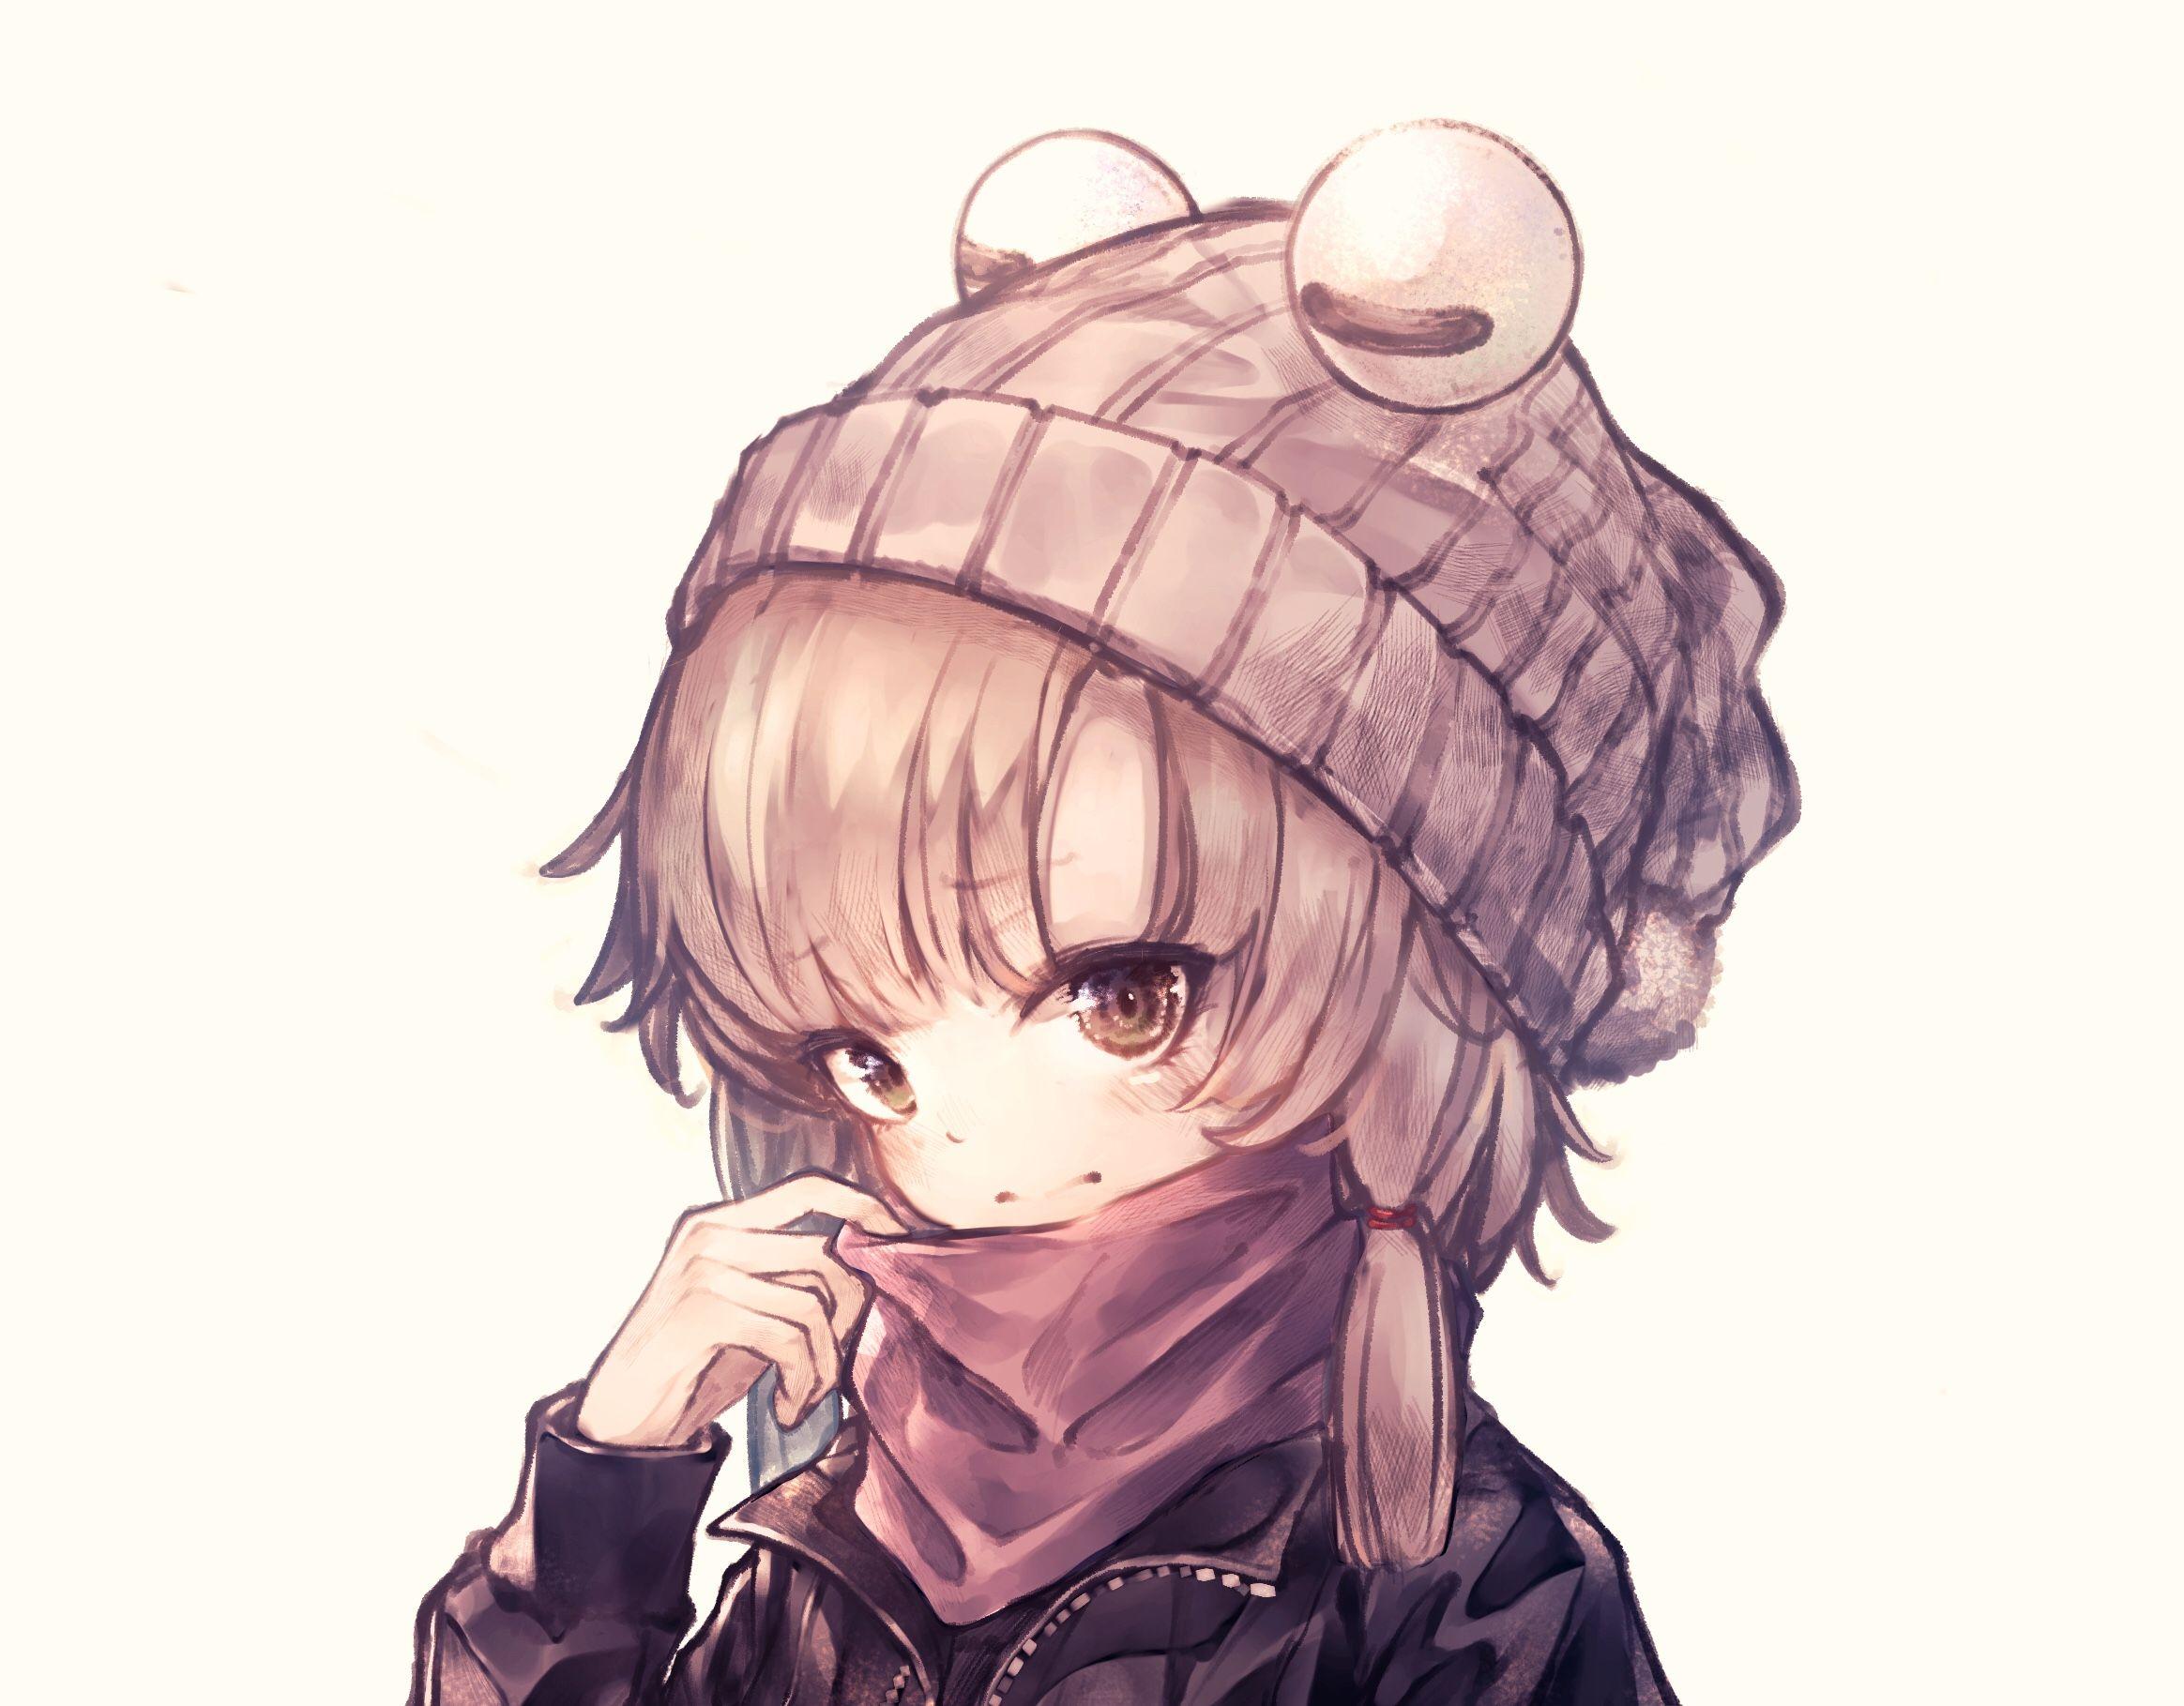 Cold Weather Suwako Touhou